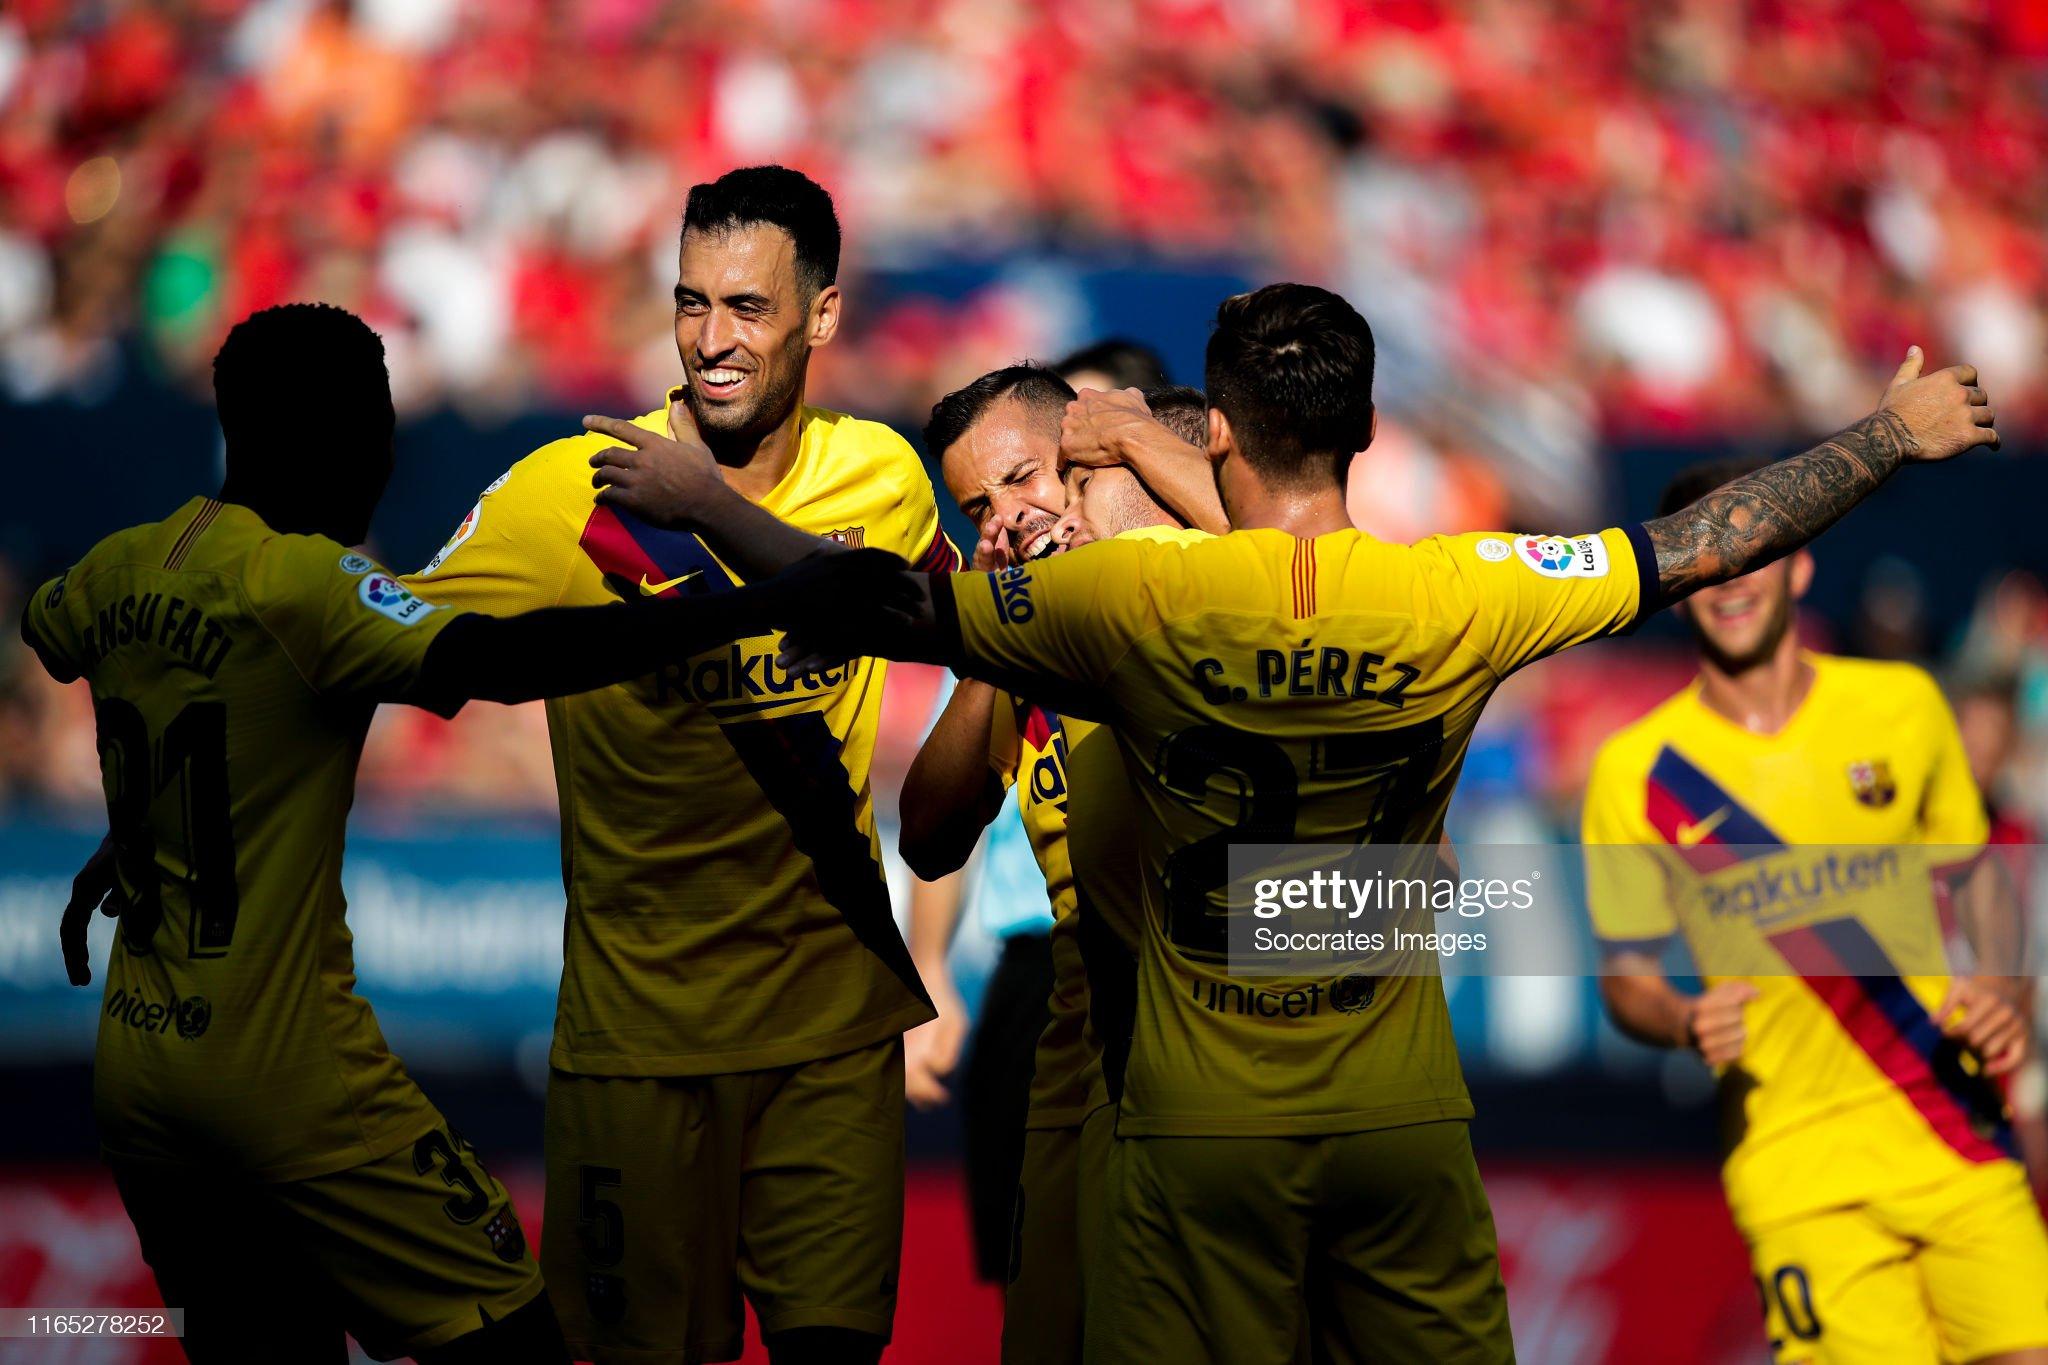 صور مباراة : أوساسونا - برشلونة 2-2 ( 31-08-2019 )  Ansu-fati-of-fc-barcelona-sergio-busquets-of-fc-barcelona-jordi-alba-picture-id1165278252?s=2048x2048